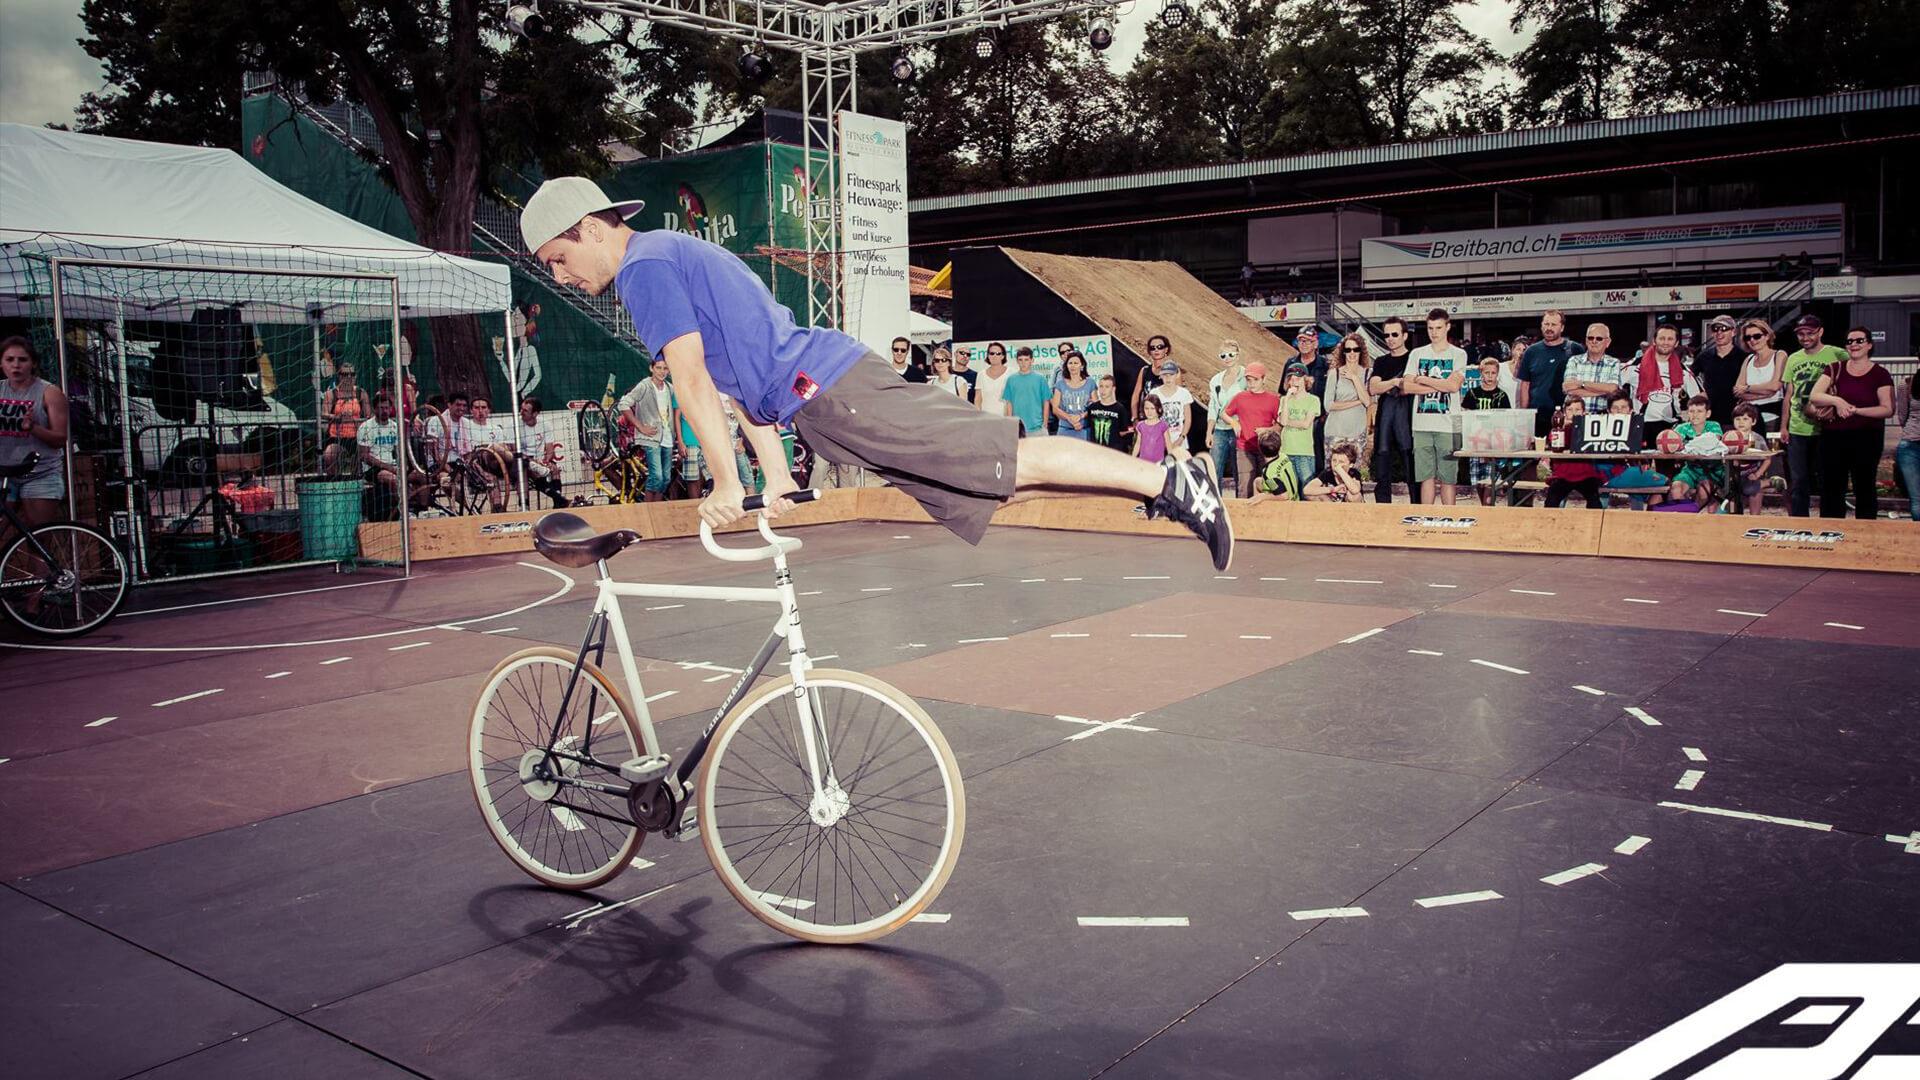 show-mit-fahrrad